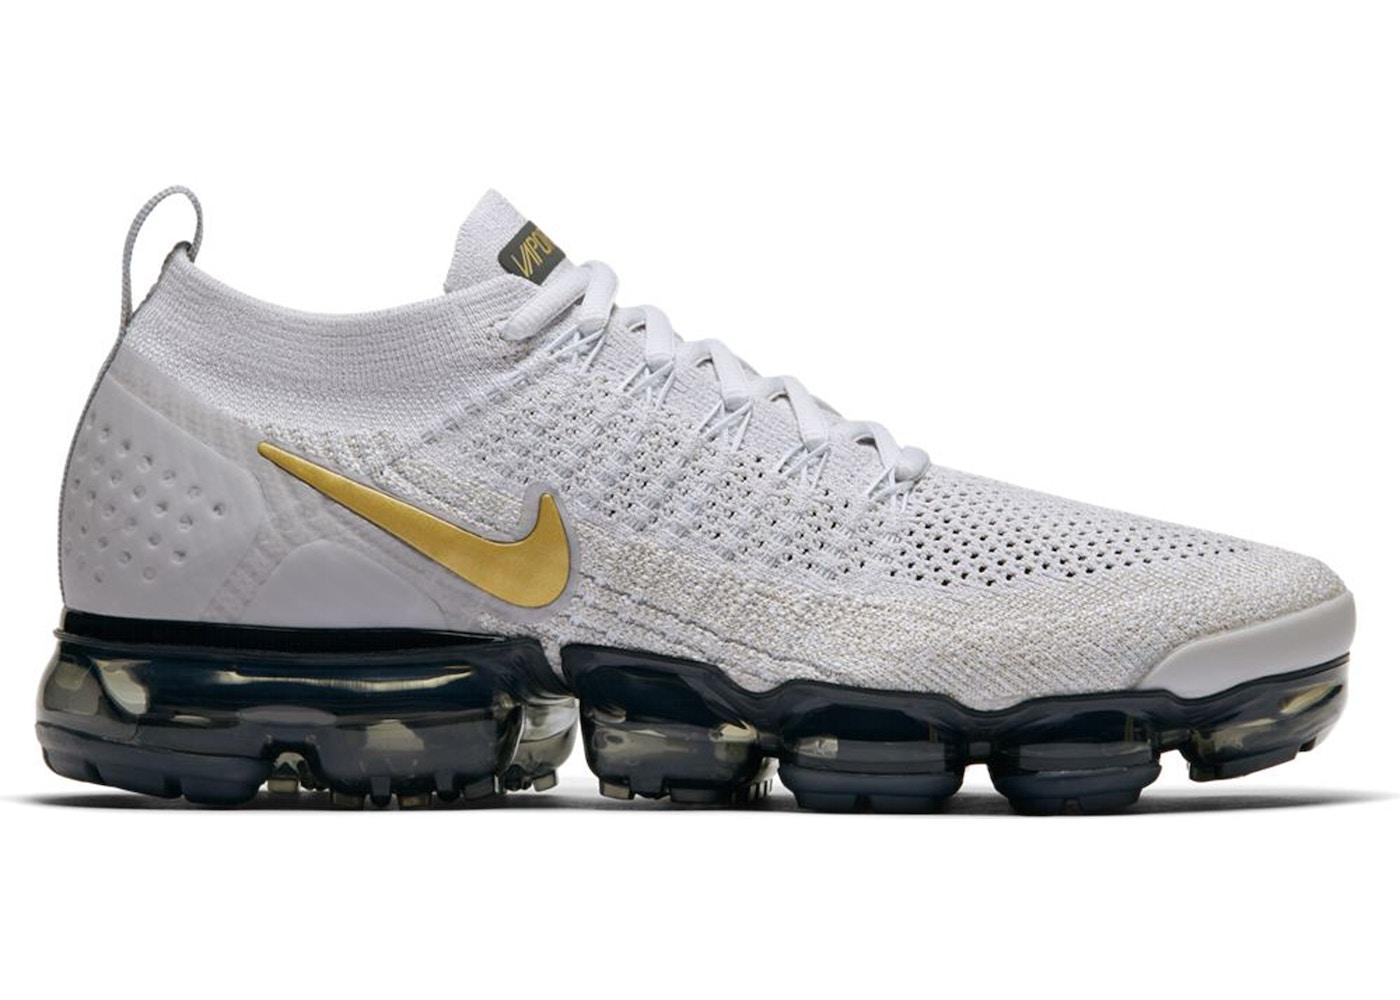 e618b9eabae Nike VaporMax Flyknit Moc 2 Women s Shoe. Nike Air Max Vision  Vast  grey white